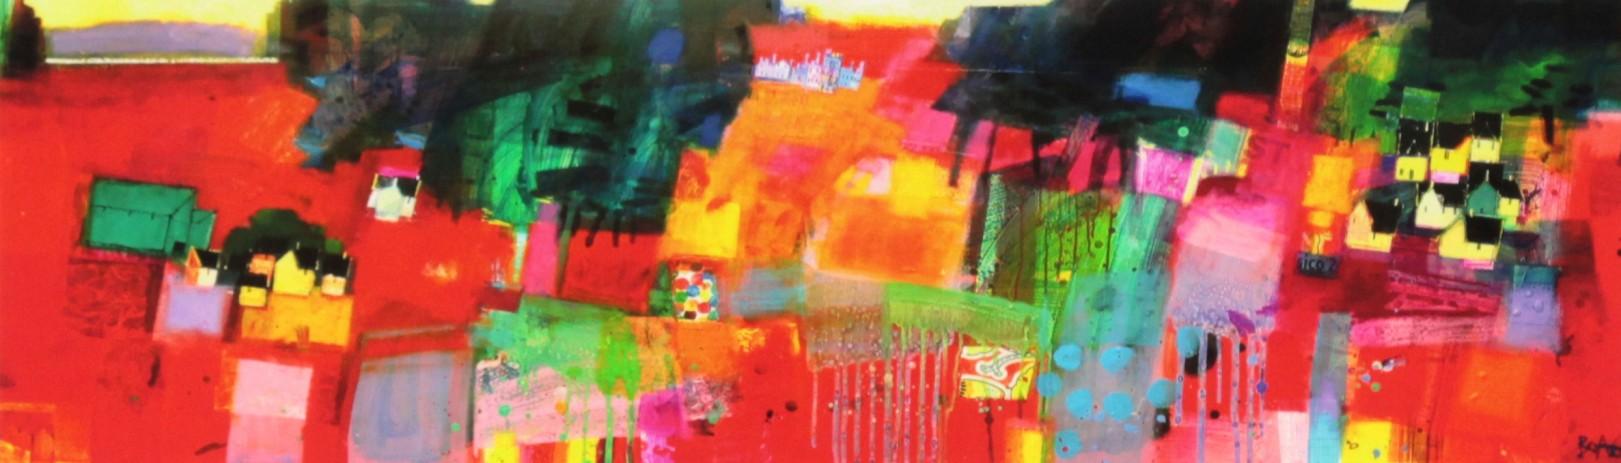 Francis Boag_Ury House Ramble_Signed Limited Edition Print Giclee_Image 7x23